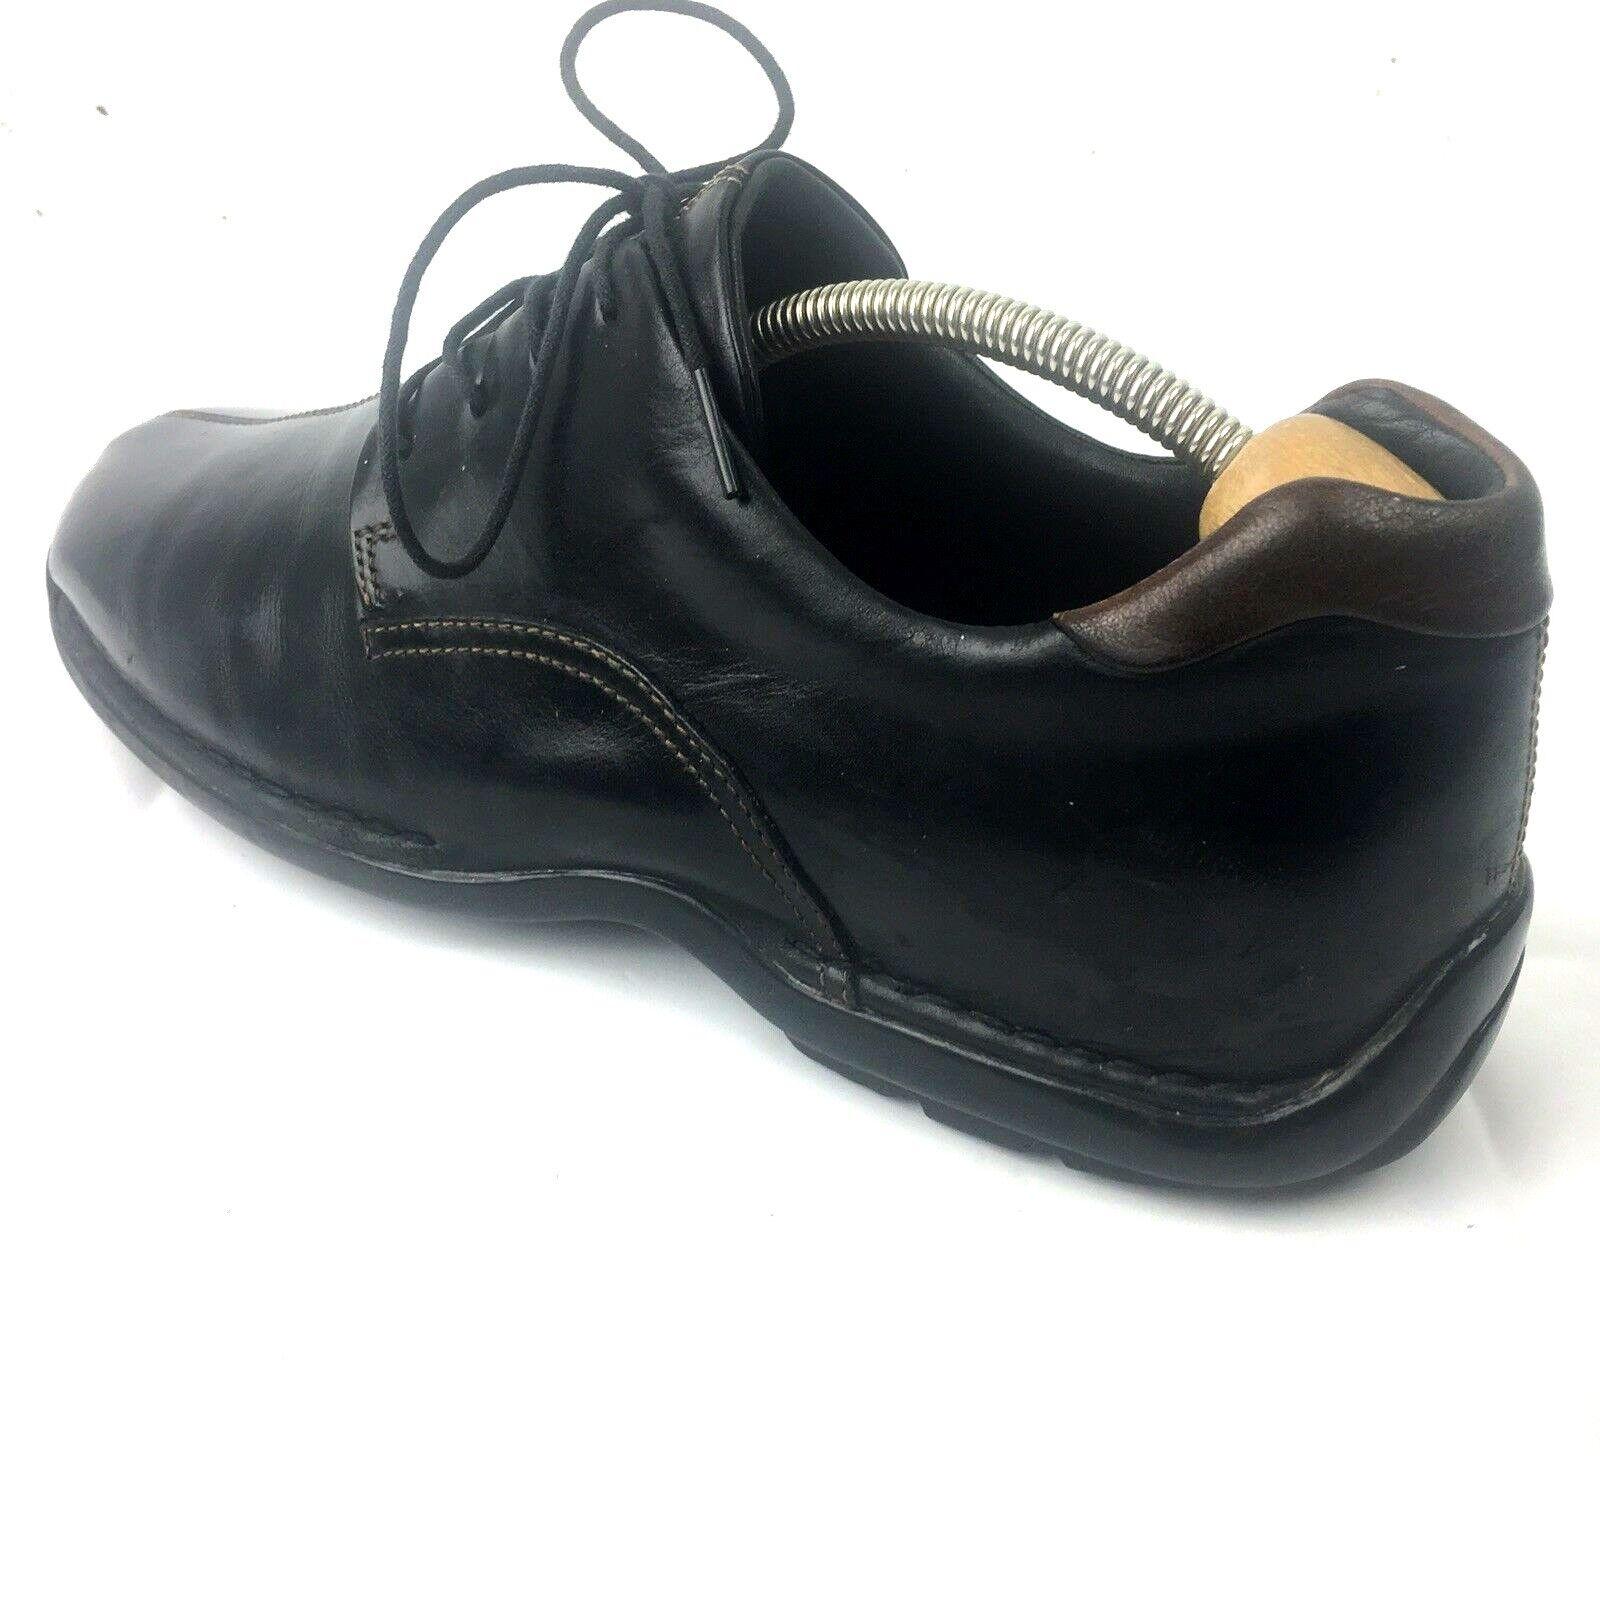 COLE HAAN Men's Dress Derby shoes Split Toe Leather Lace Italian Oxfords 12M